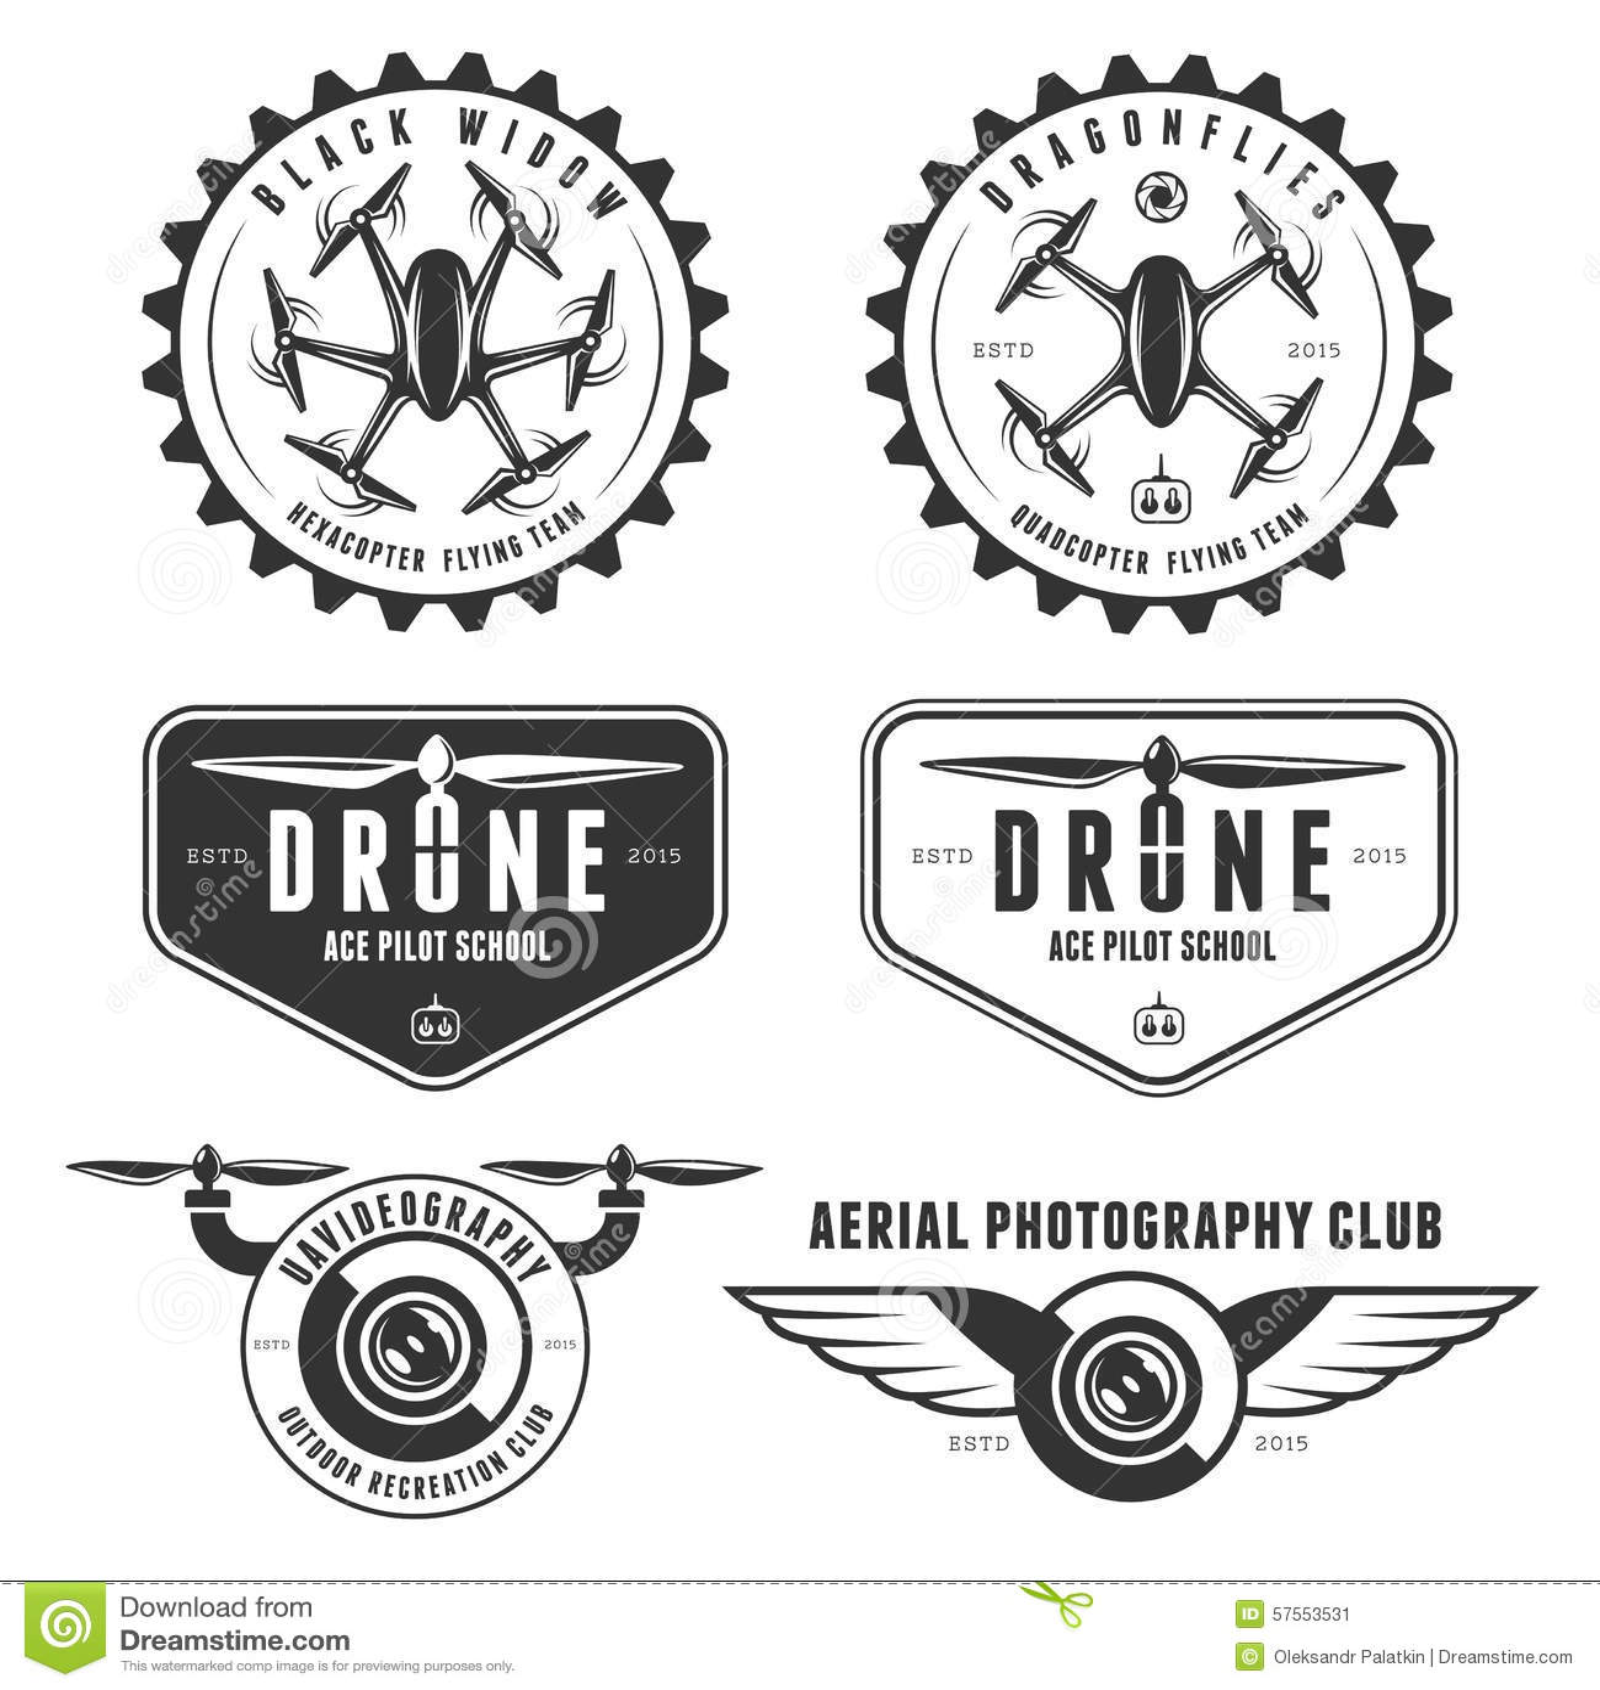 Grupo do vetor de etiquetas do clube do voo do zangão, crachás